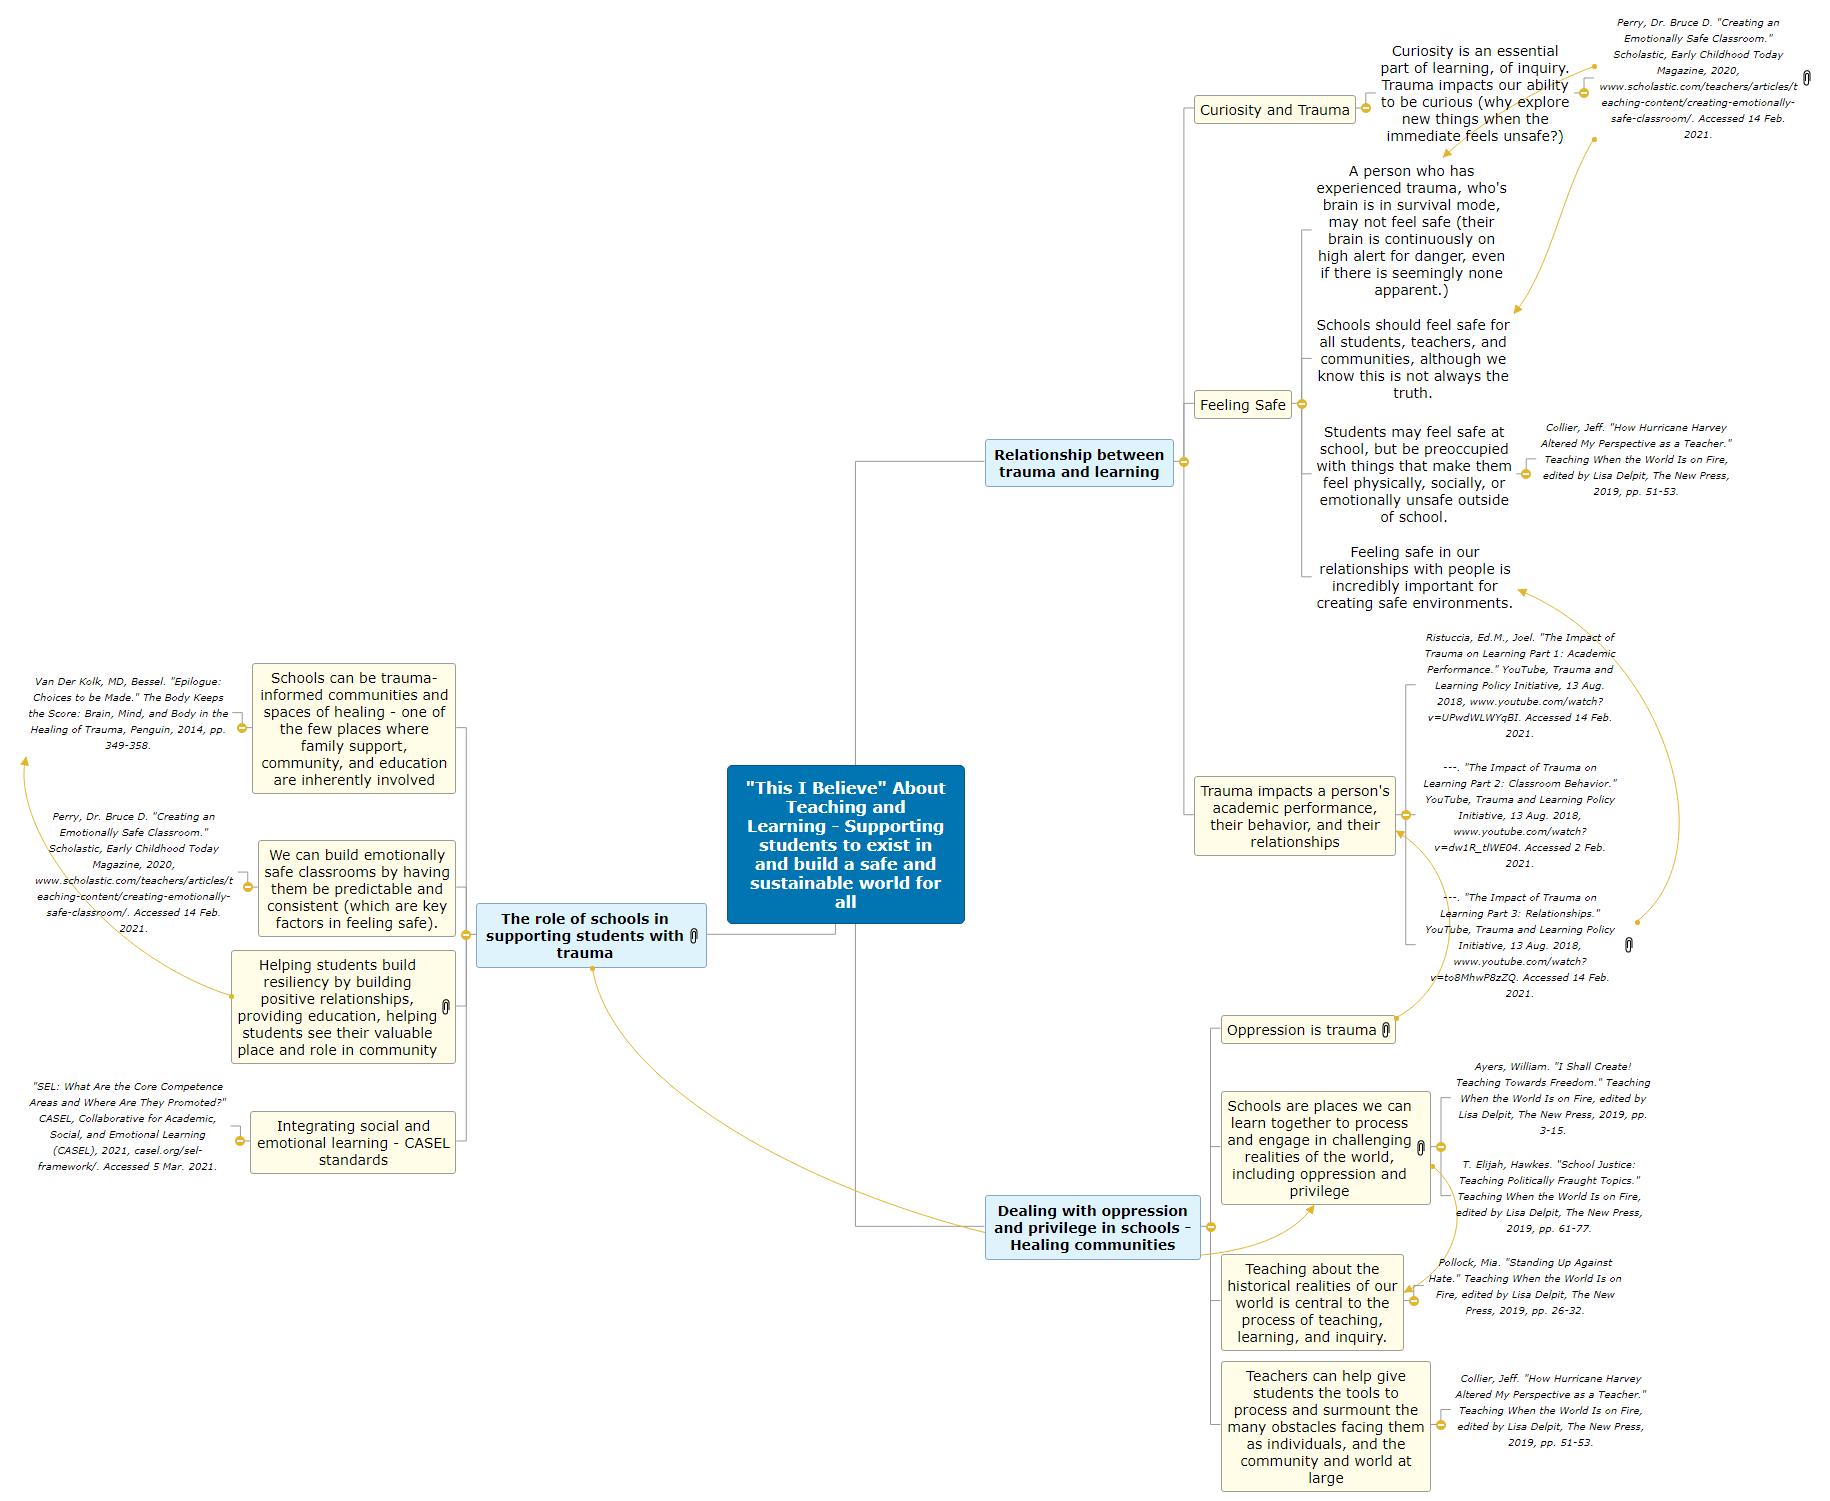 RWoodard_This I Believe_MindMap Mind Map